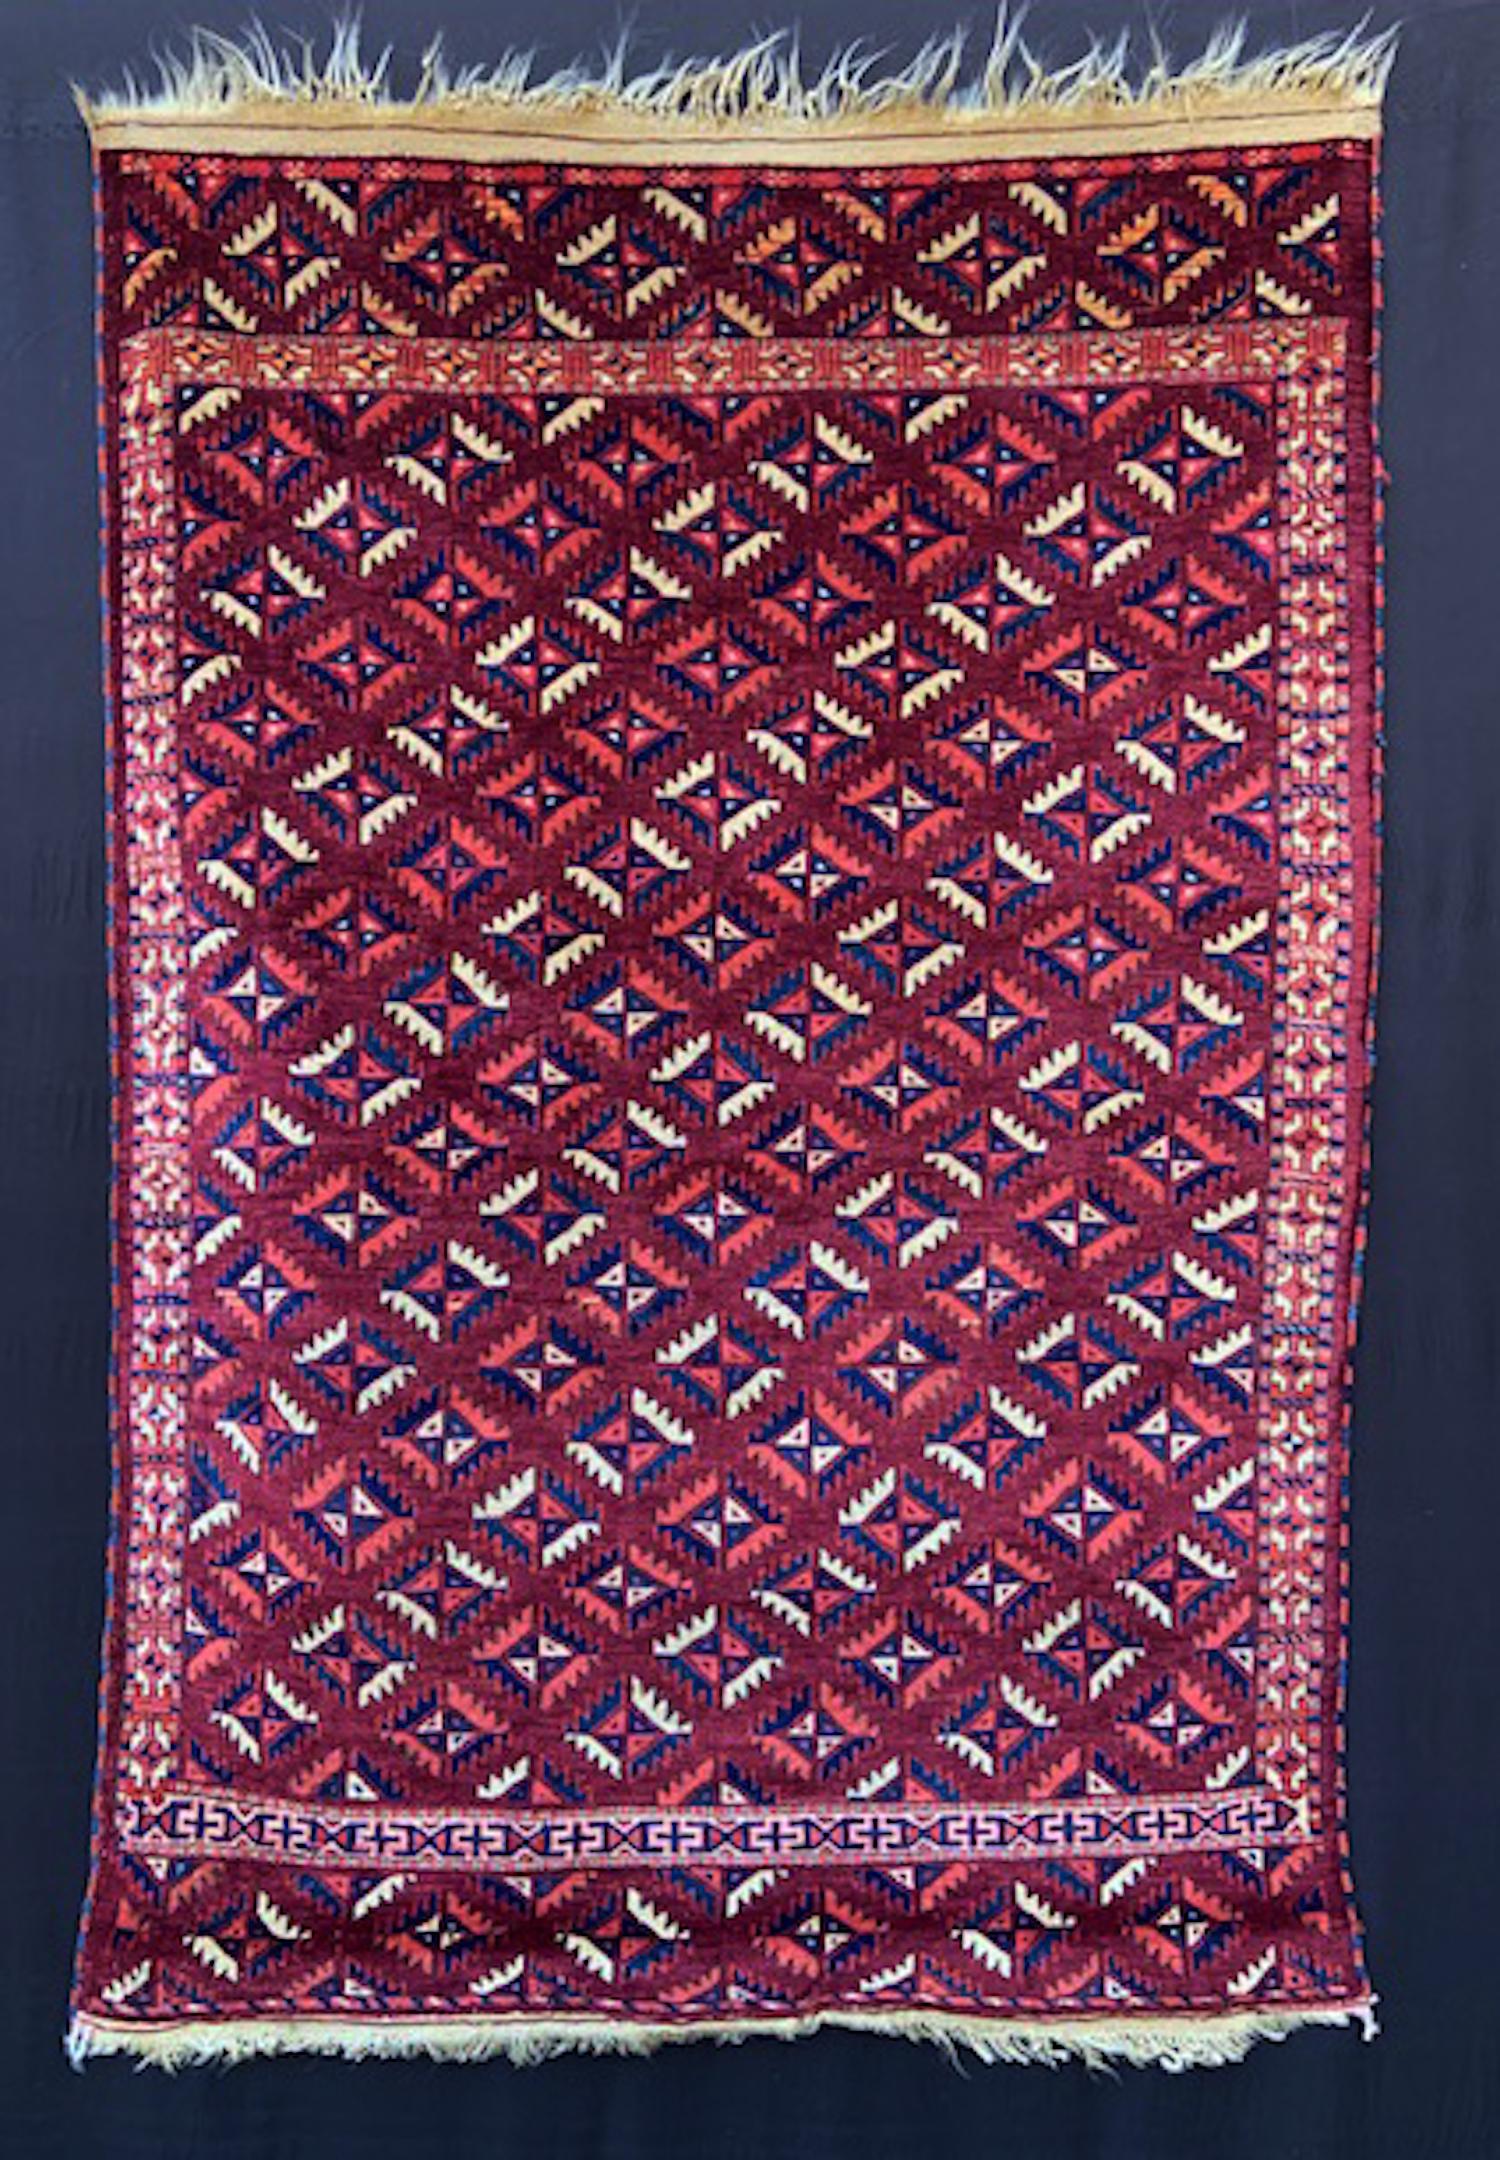 Goklen Turkmen Wedding Rug